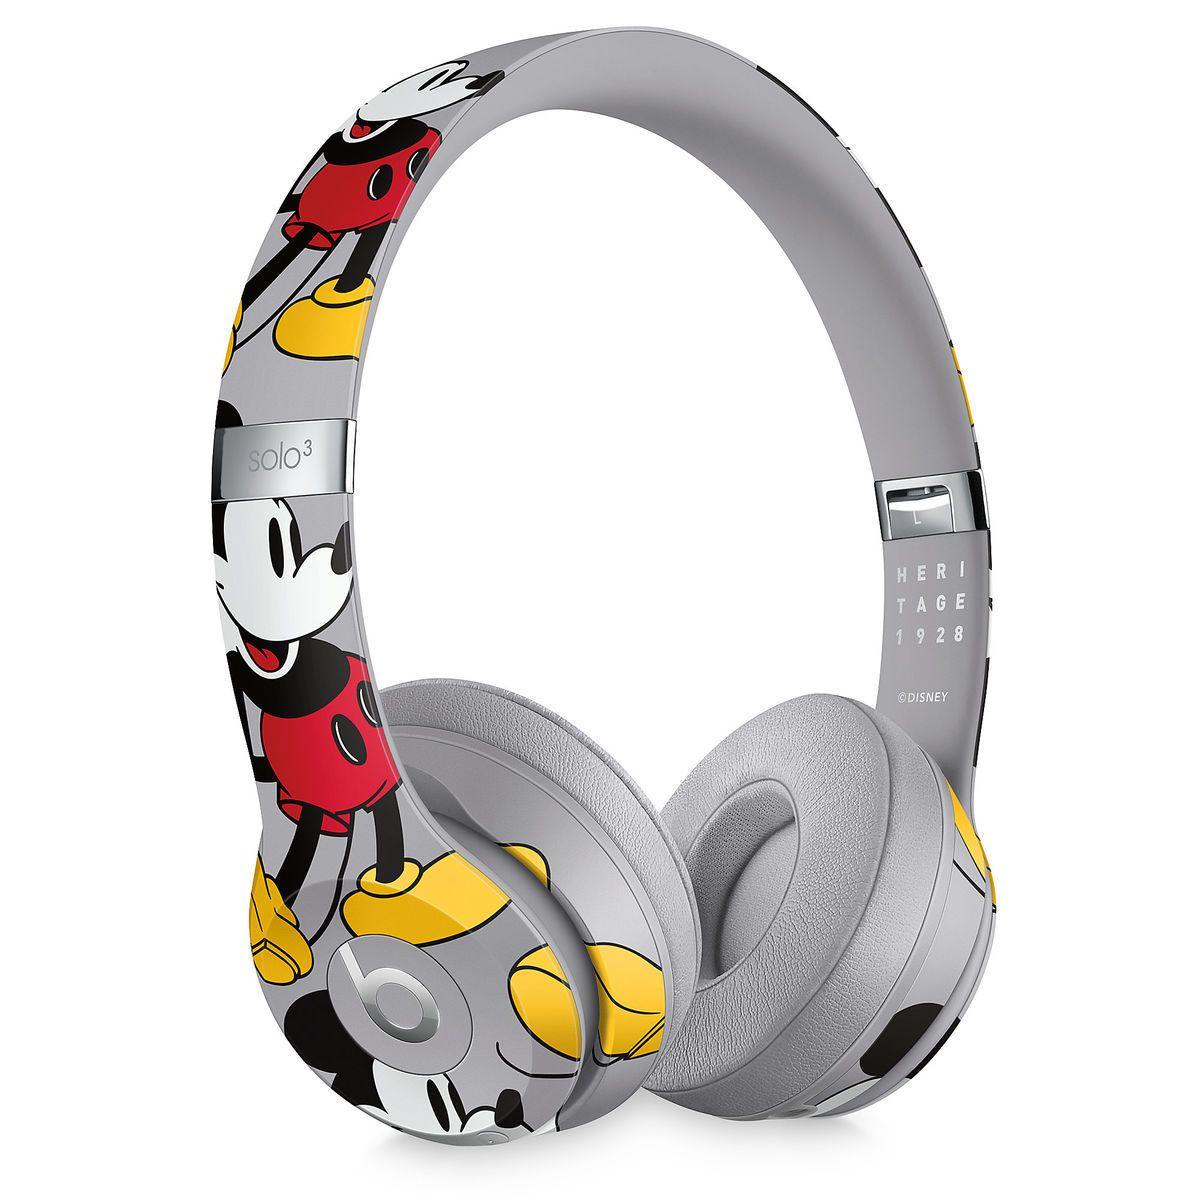 Beats Solo3 Wireless Headphones Mickey S 90th Anniversary Edition Gray Wireless Headphones Headphones Cute Headphones